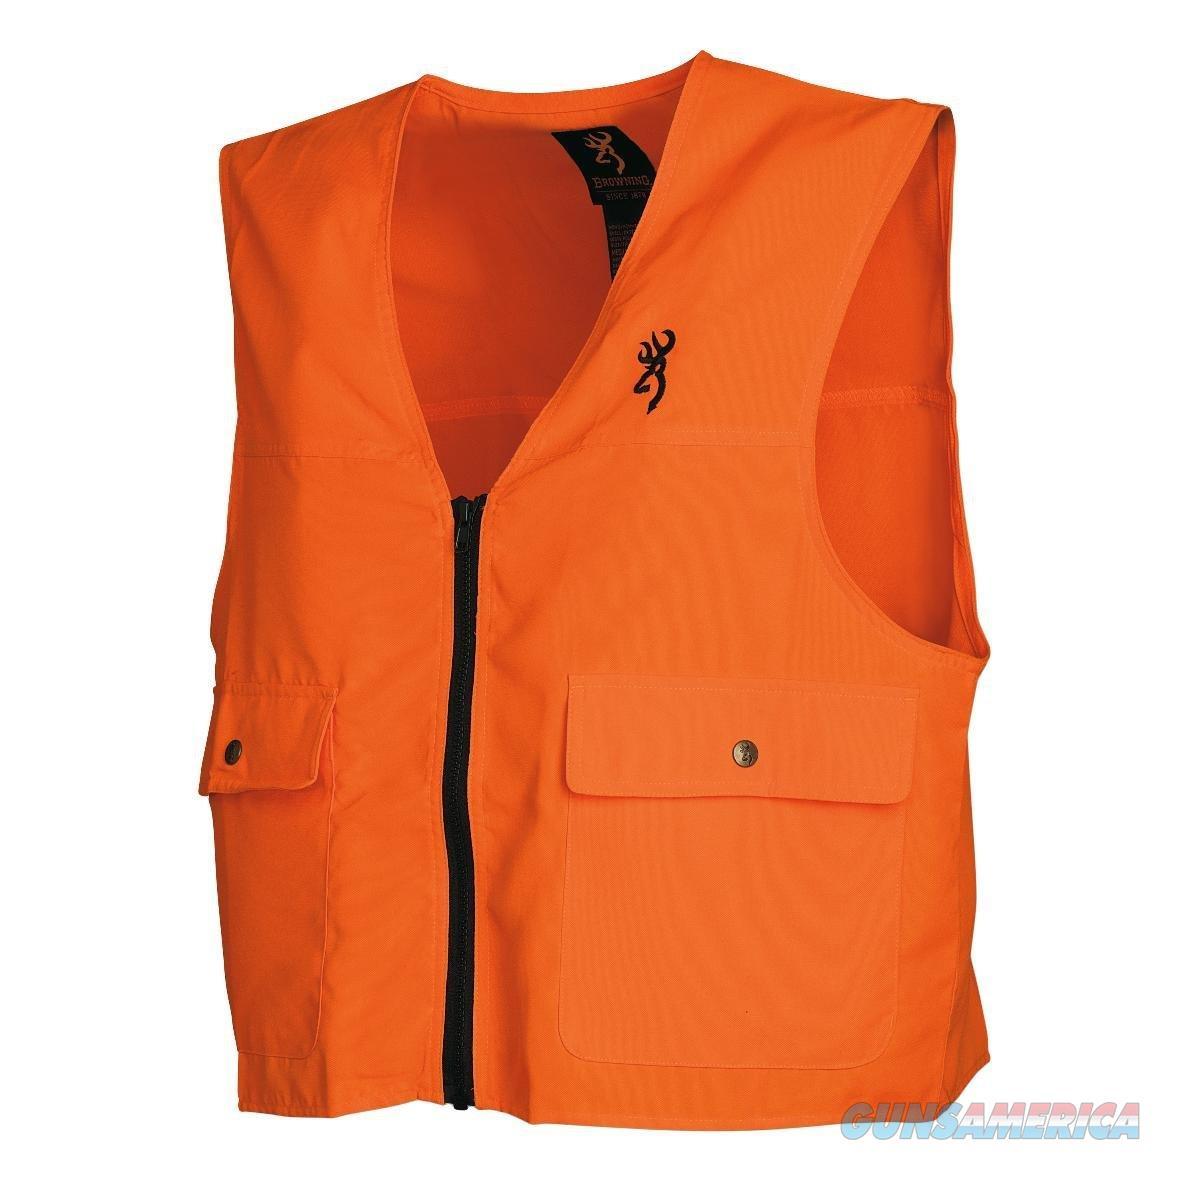 Browning Safety Vest XL Blaze Orange  Non-Guns > Hunting Clothing and Equipment > Clothing > Blaze Orange